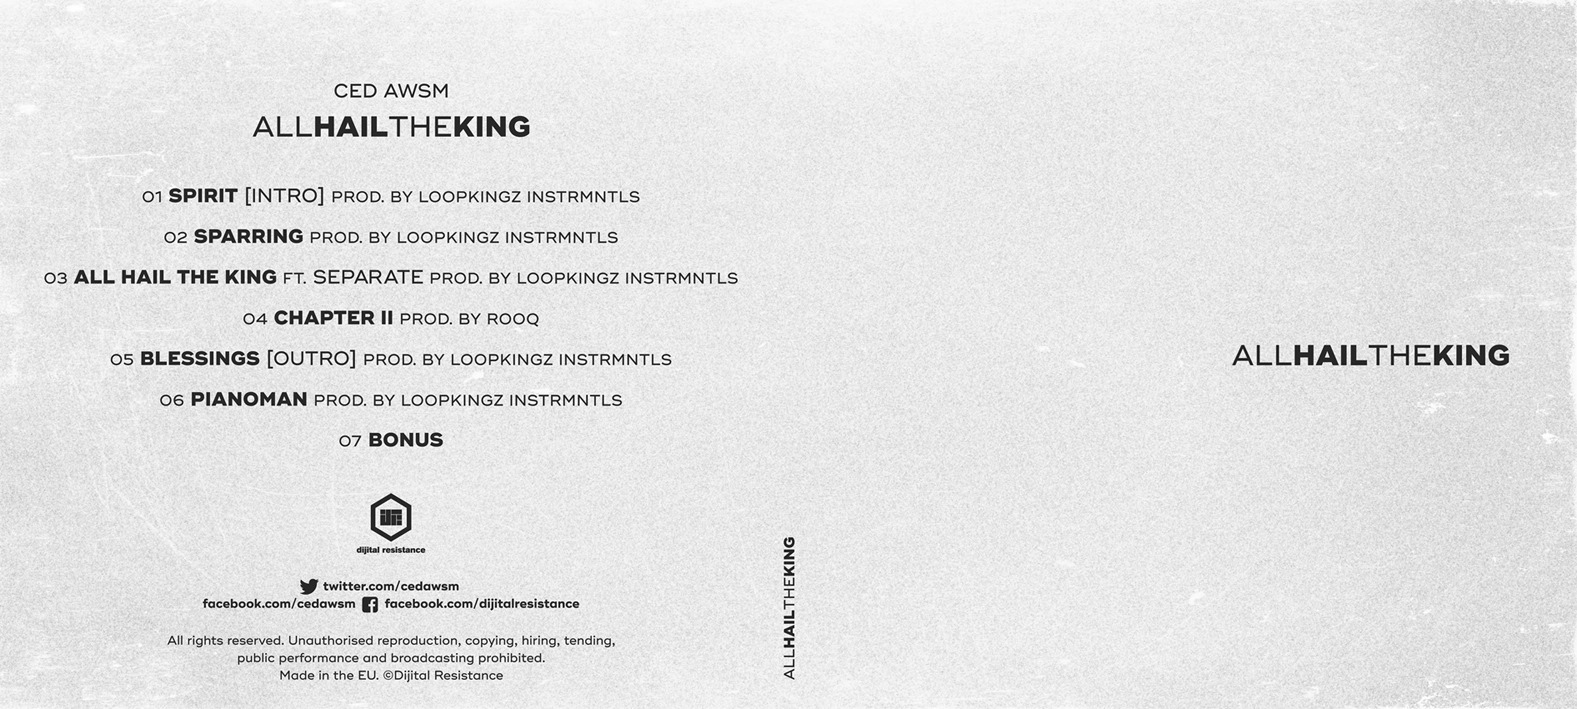 CED AWSM - allHAILtheKING